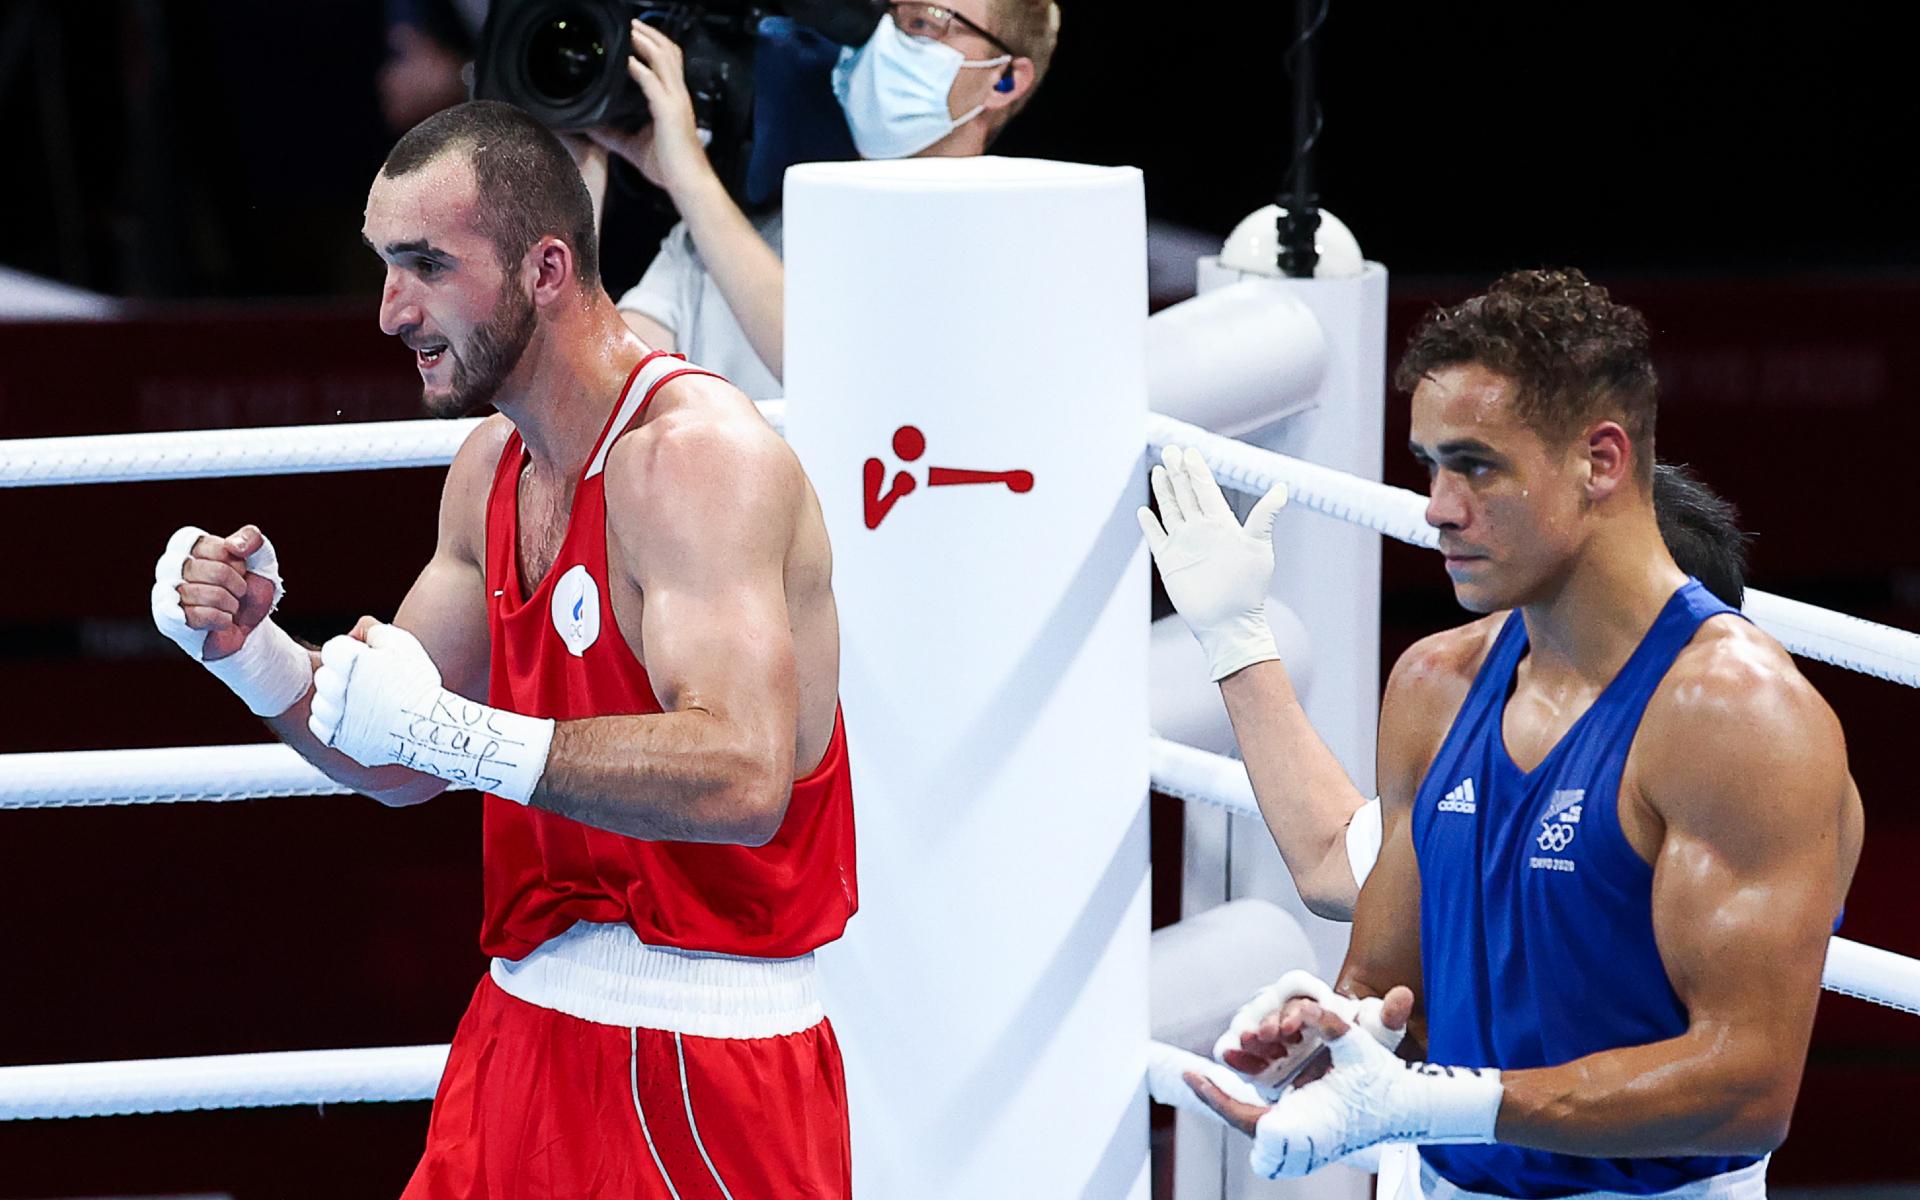 Фото: Муслим Гаджимагомедов (слева)  (Валерий Шарифулин/ТАСС)